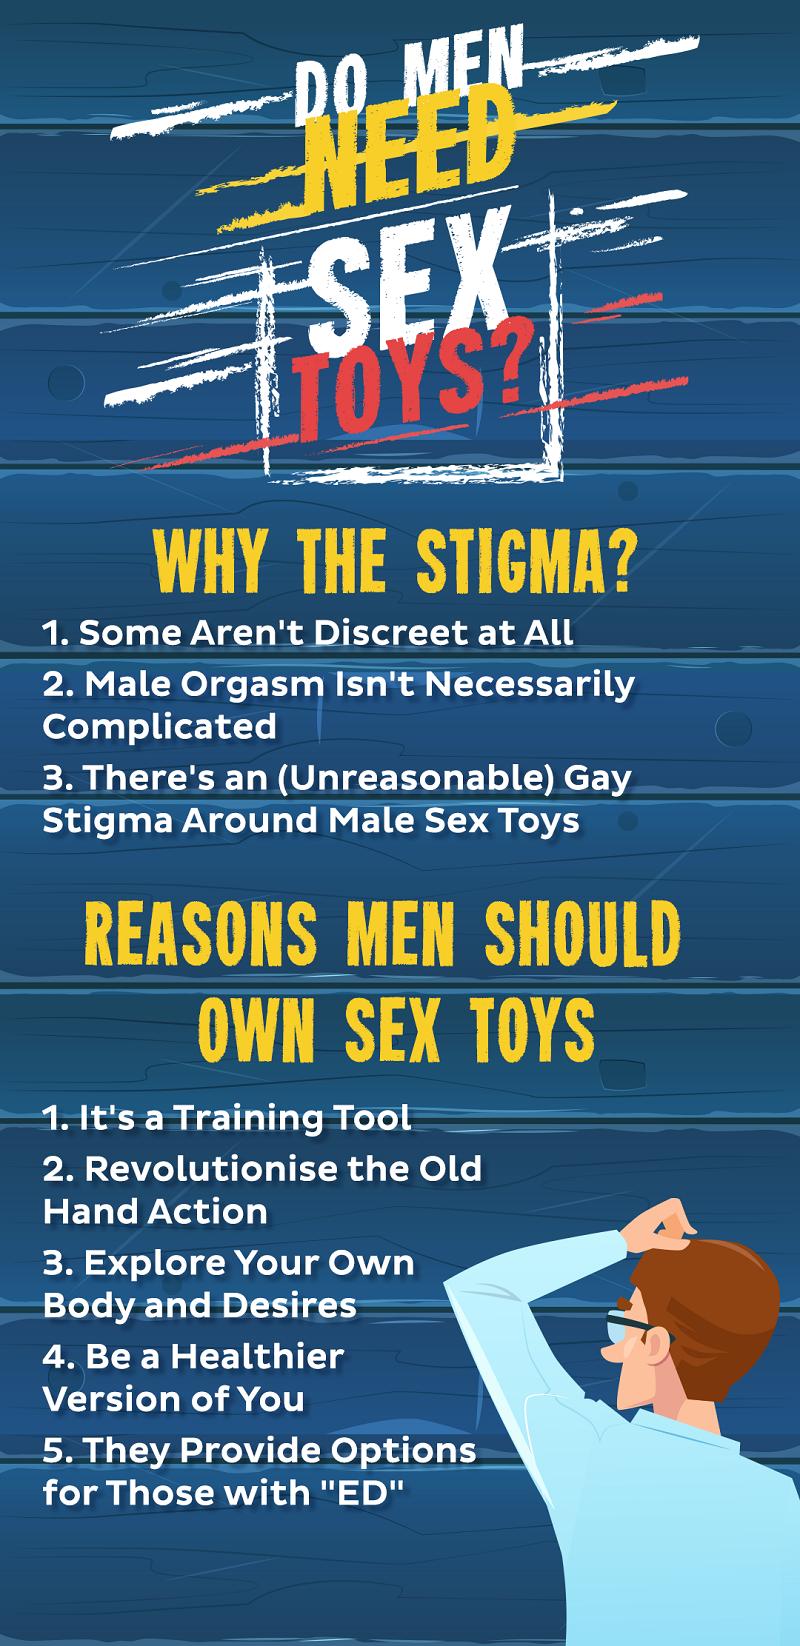 Do Men Need Sex Toys Infographic - Randy Fox